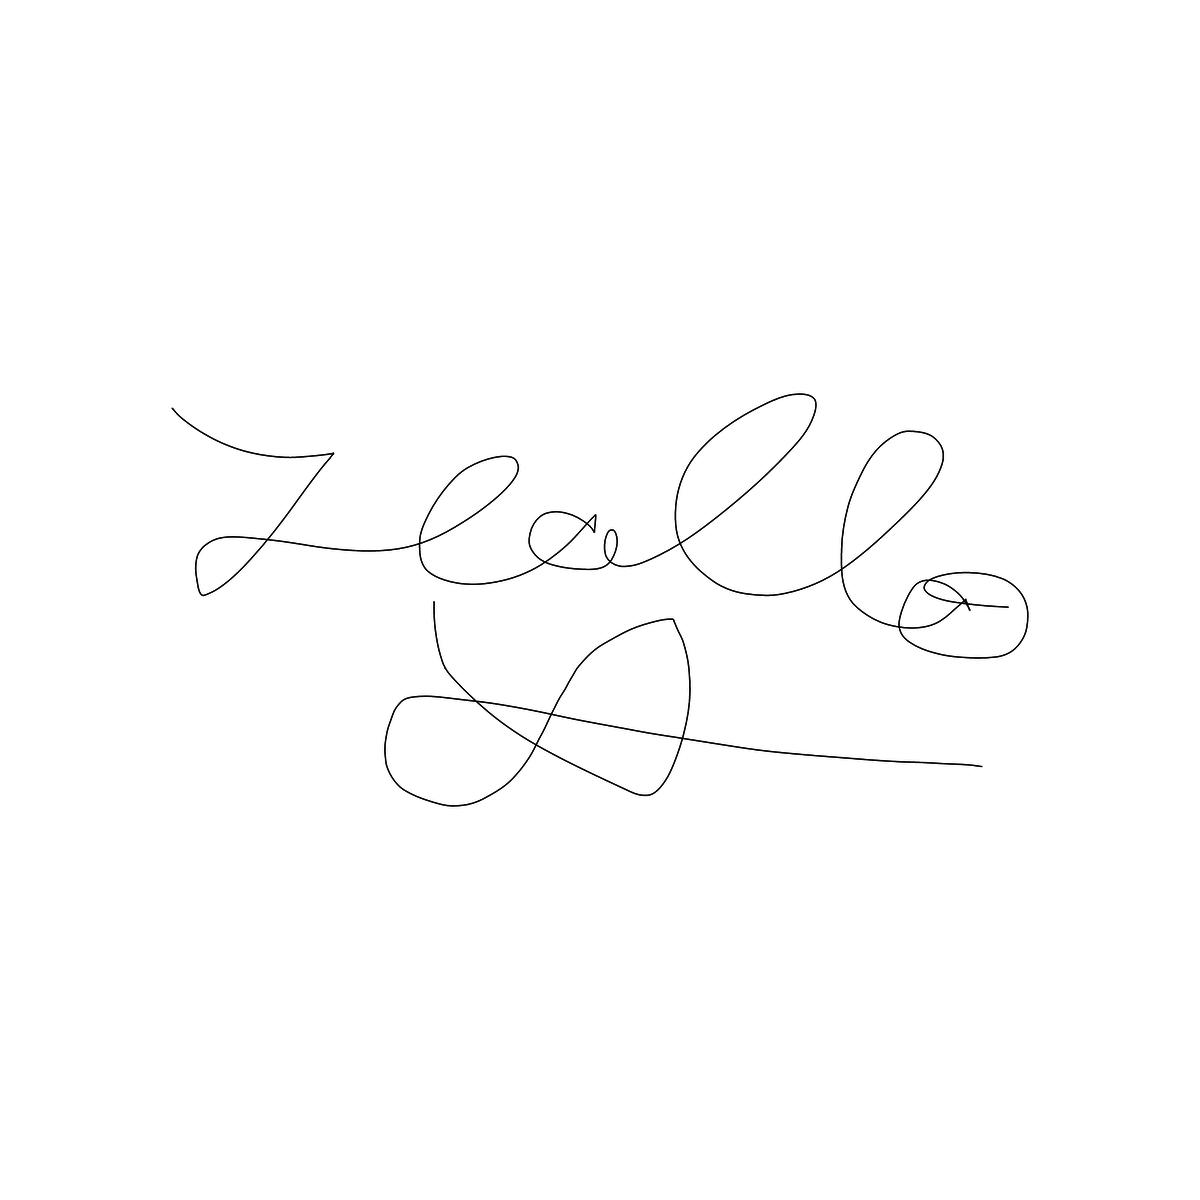 BAAAM drawing#12633 lat:52.8628044128418000lng: 4.8290271759033200